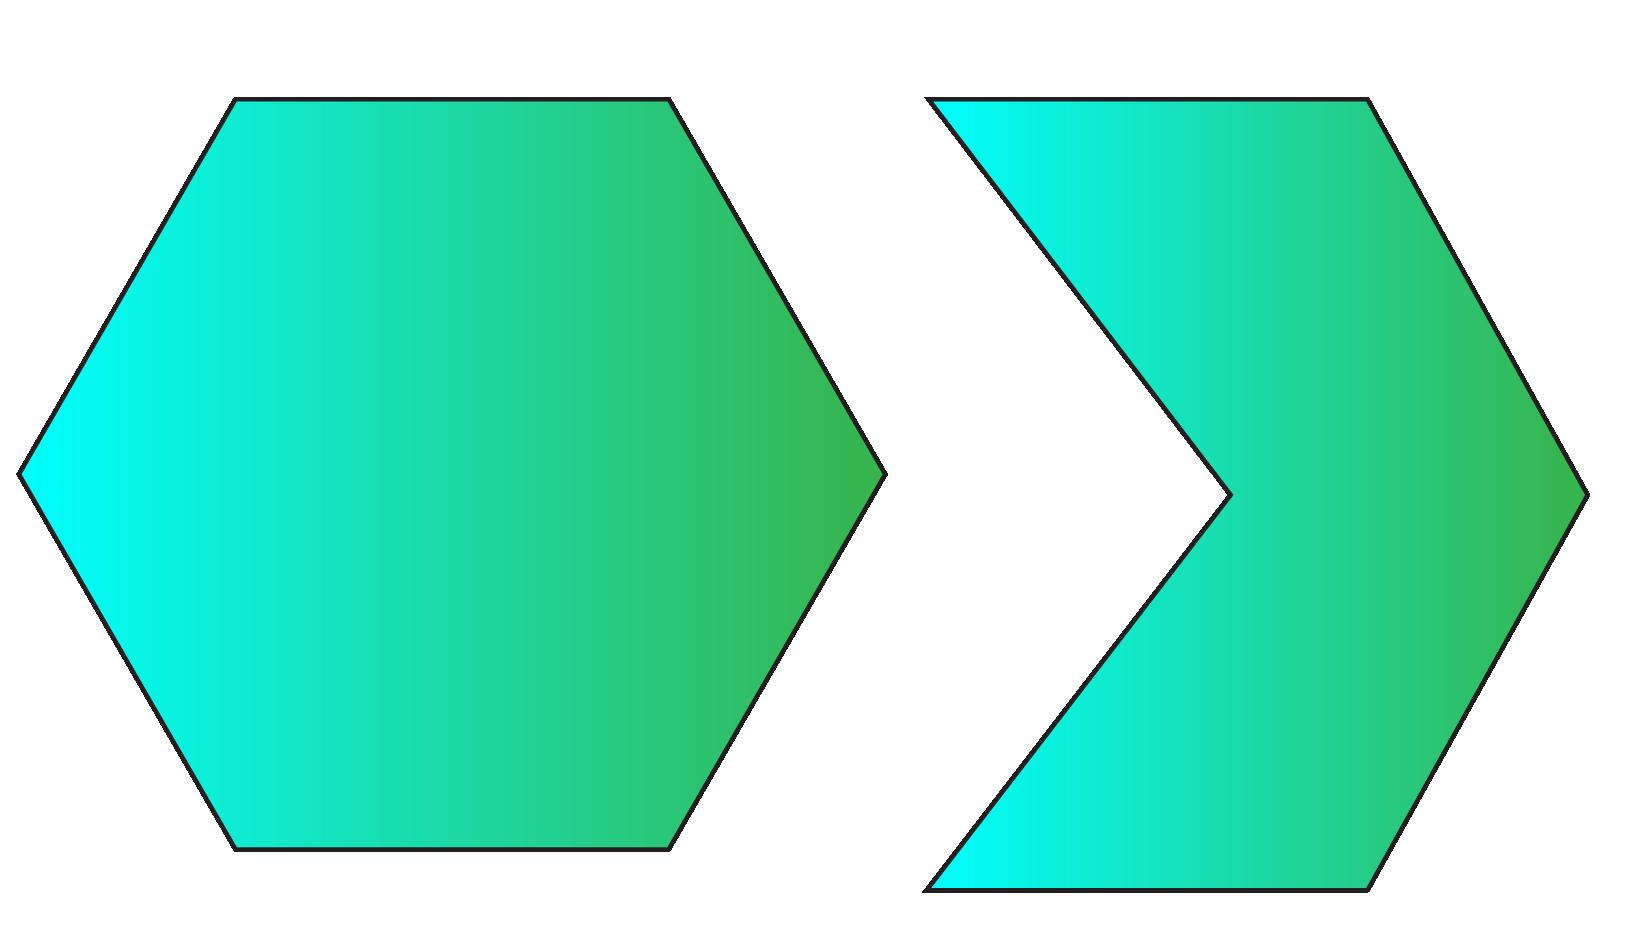 types of Hexagonal Shape